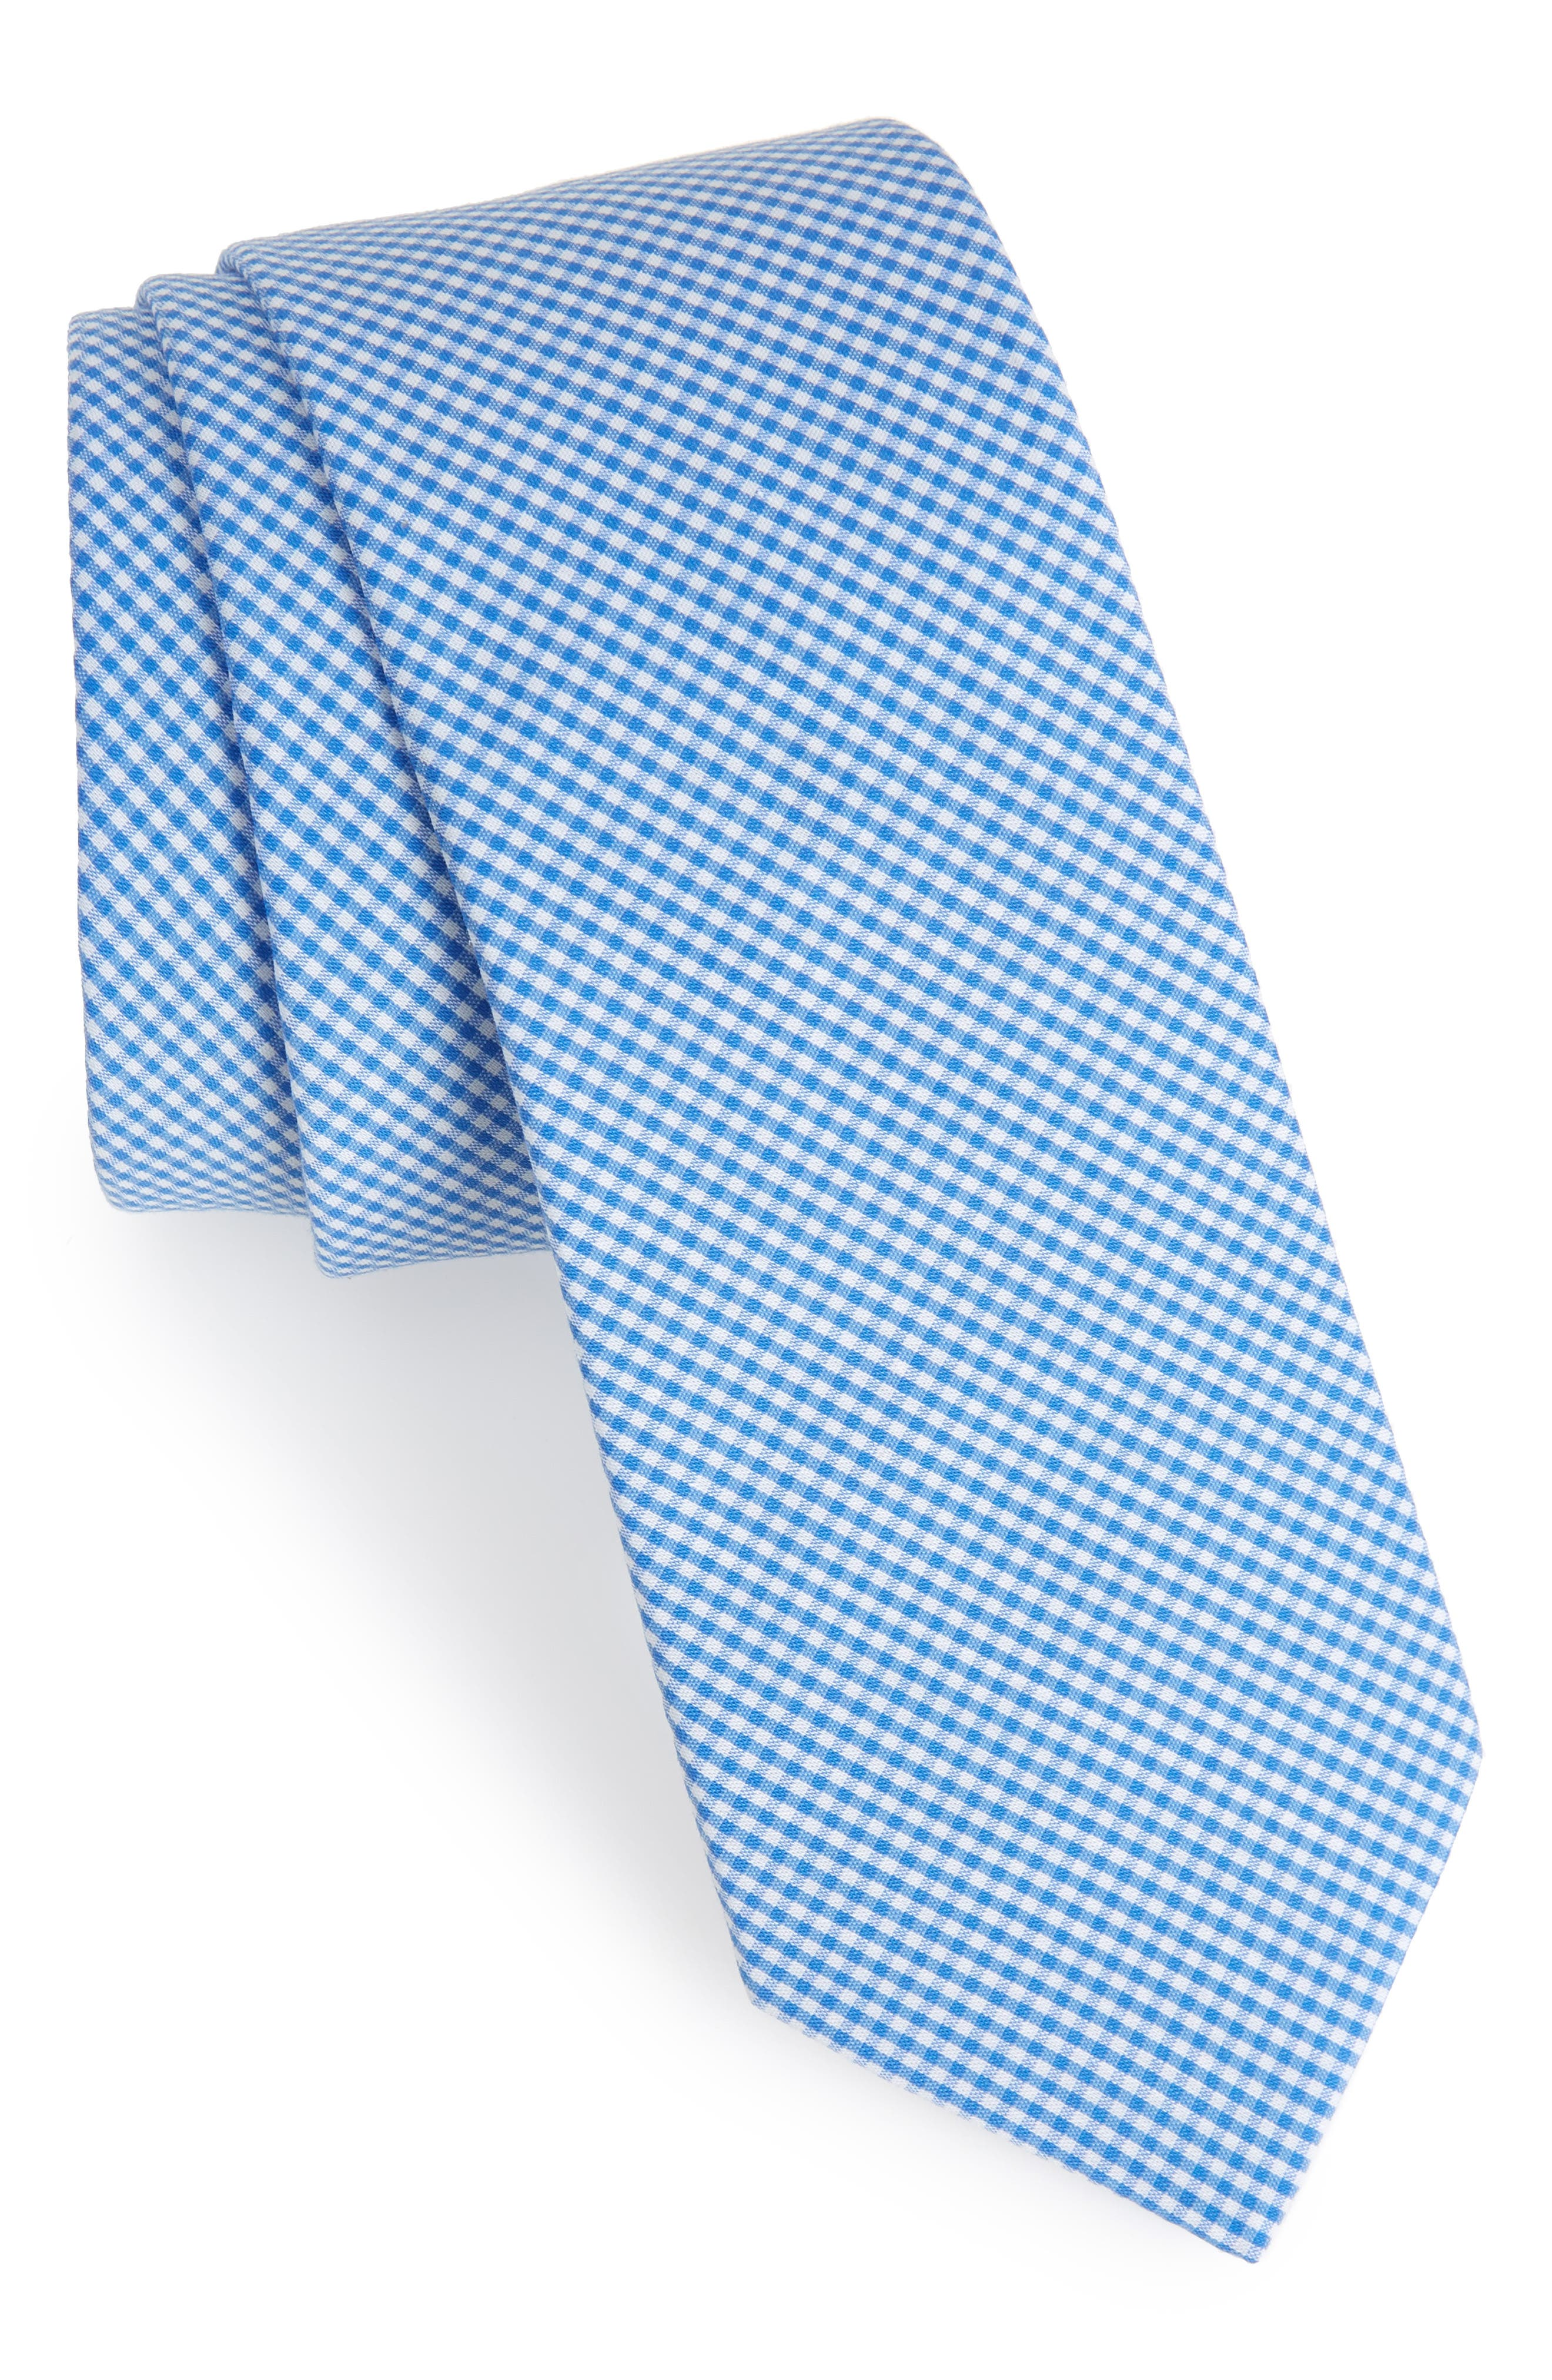 Sydney Check Cotton Skinny Tie,                             Main thumbnail 1, color,                             Light Blue